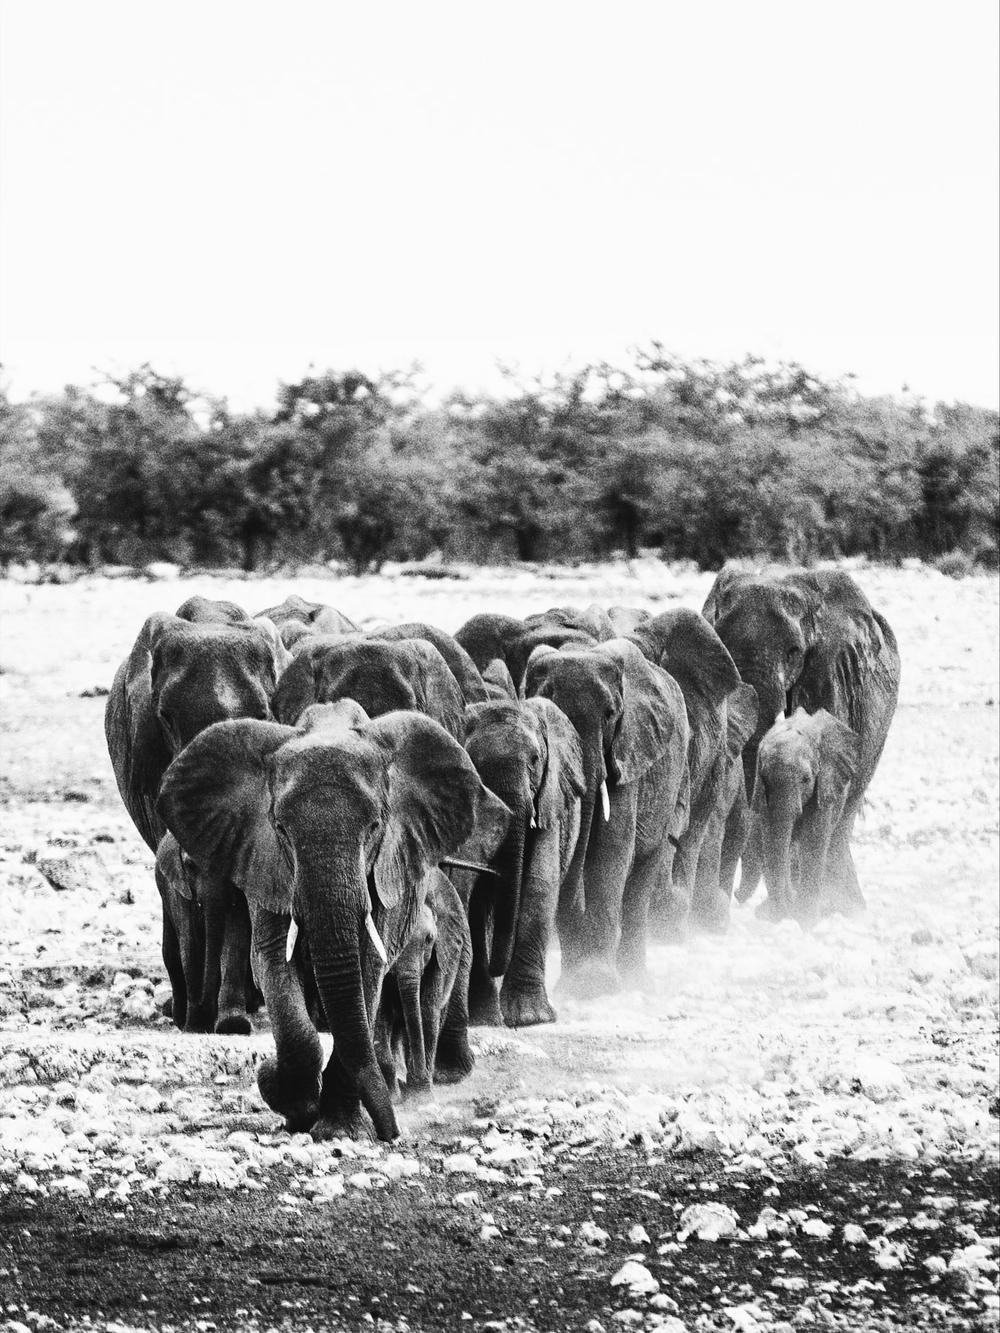 CallieGiovanna_Africa_Namibia_EtoshaNationalPark_20150101_02623.jpg